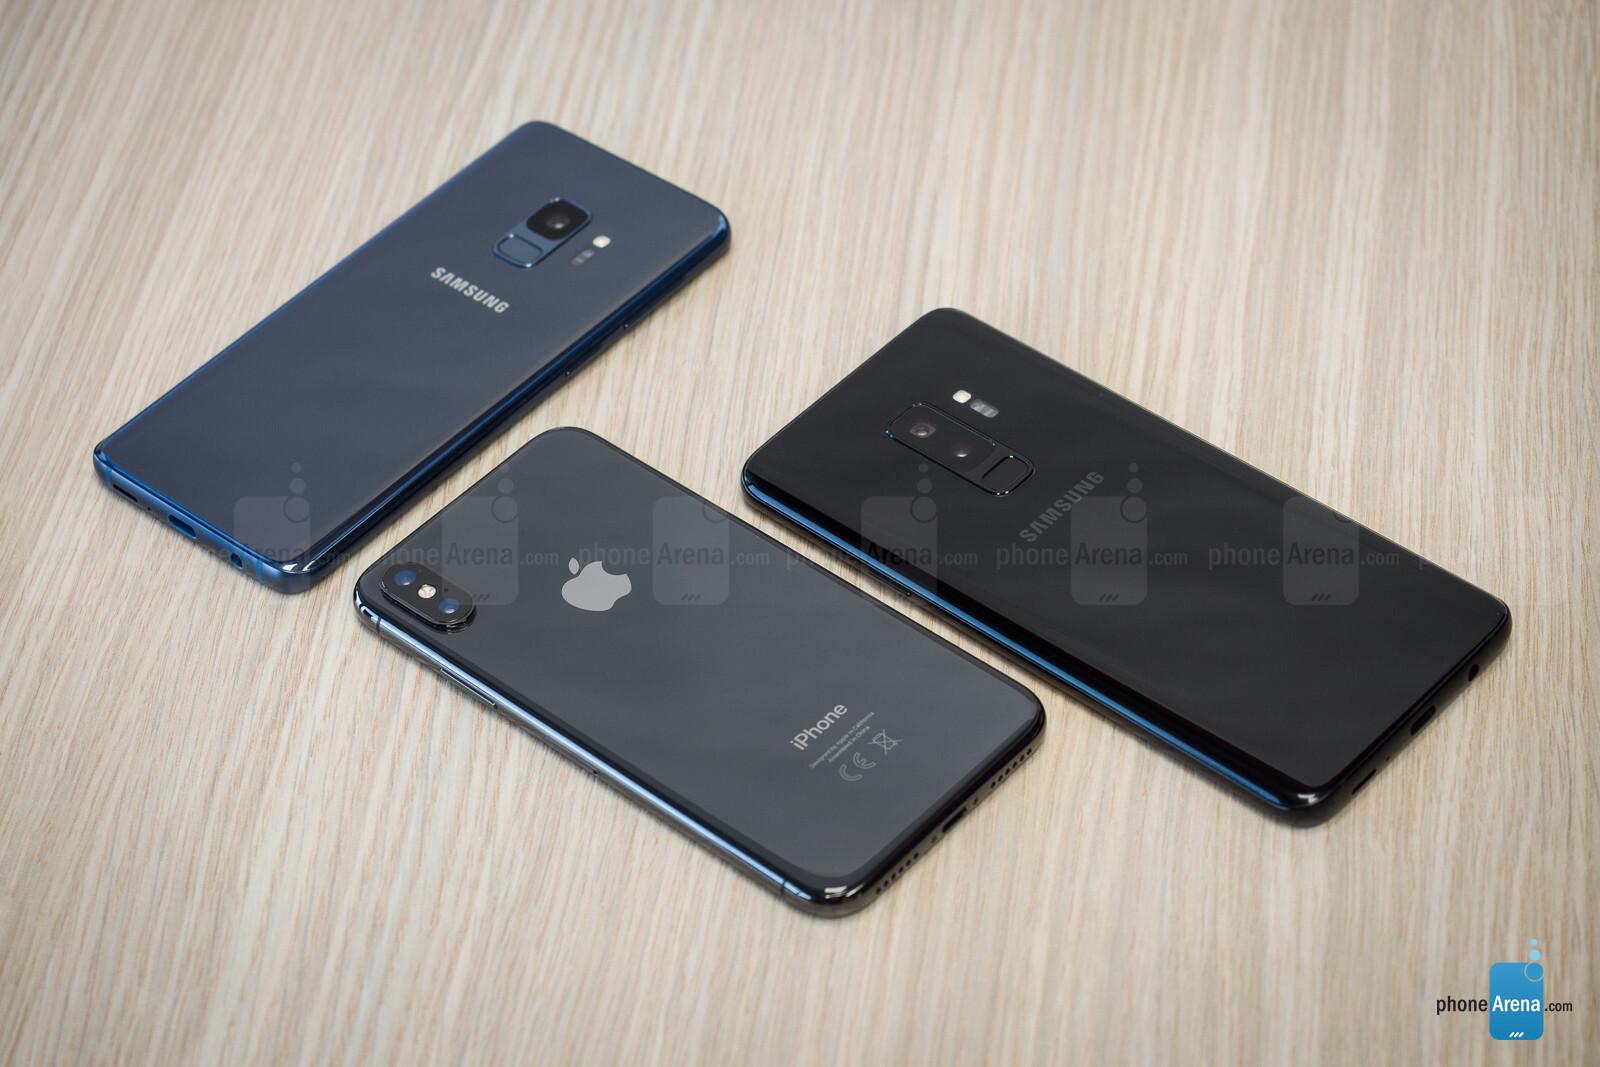 Samsung Galaxy S9 and S9+ vs Apple iPhone X - PhoneArena